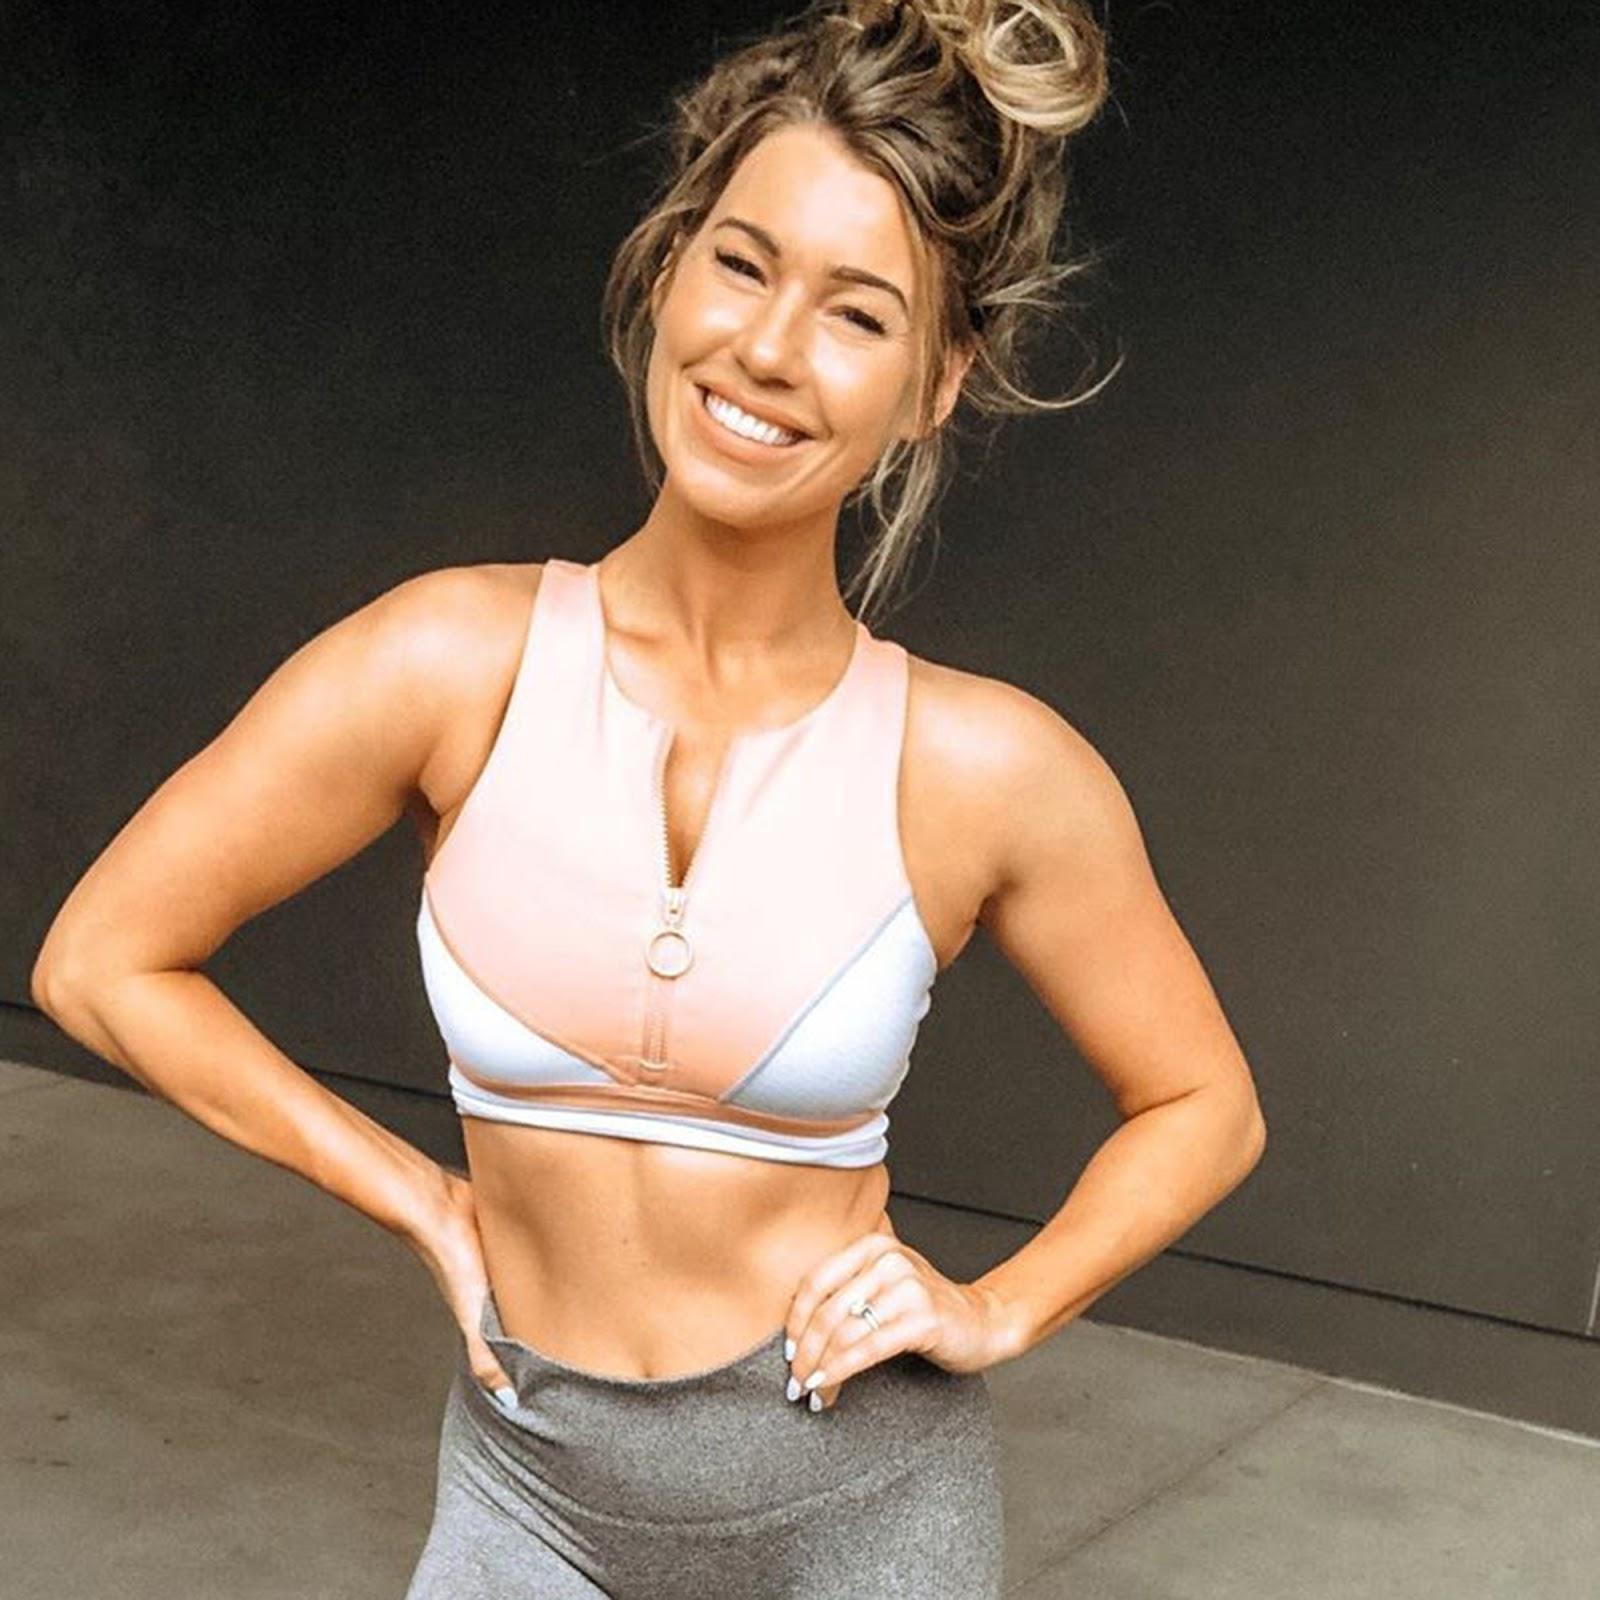 Fitness trainer Anna Victoria